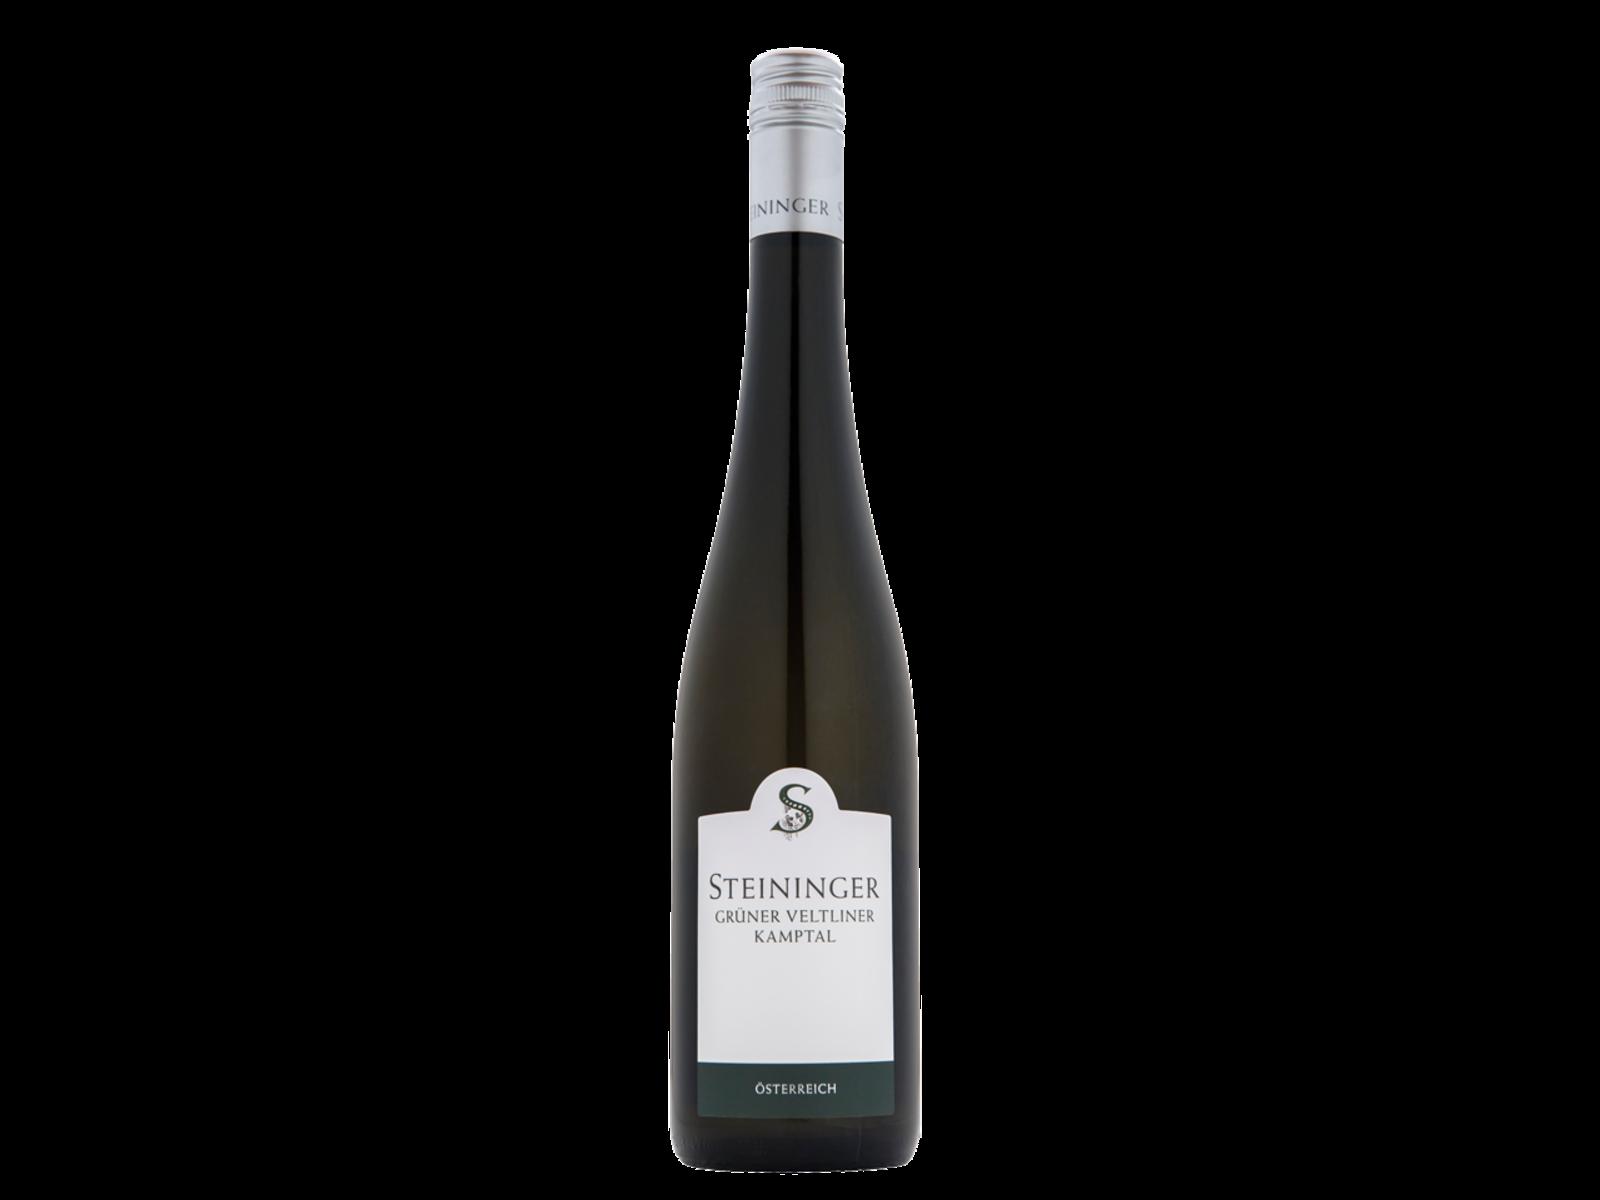 Weingut Karl Steininger Steininger / Grüner Veltliner Kamptal